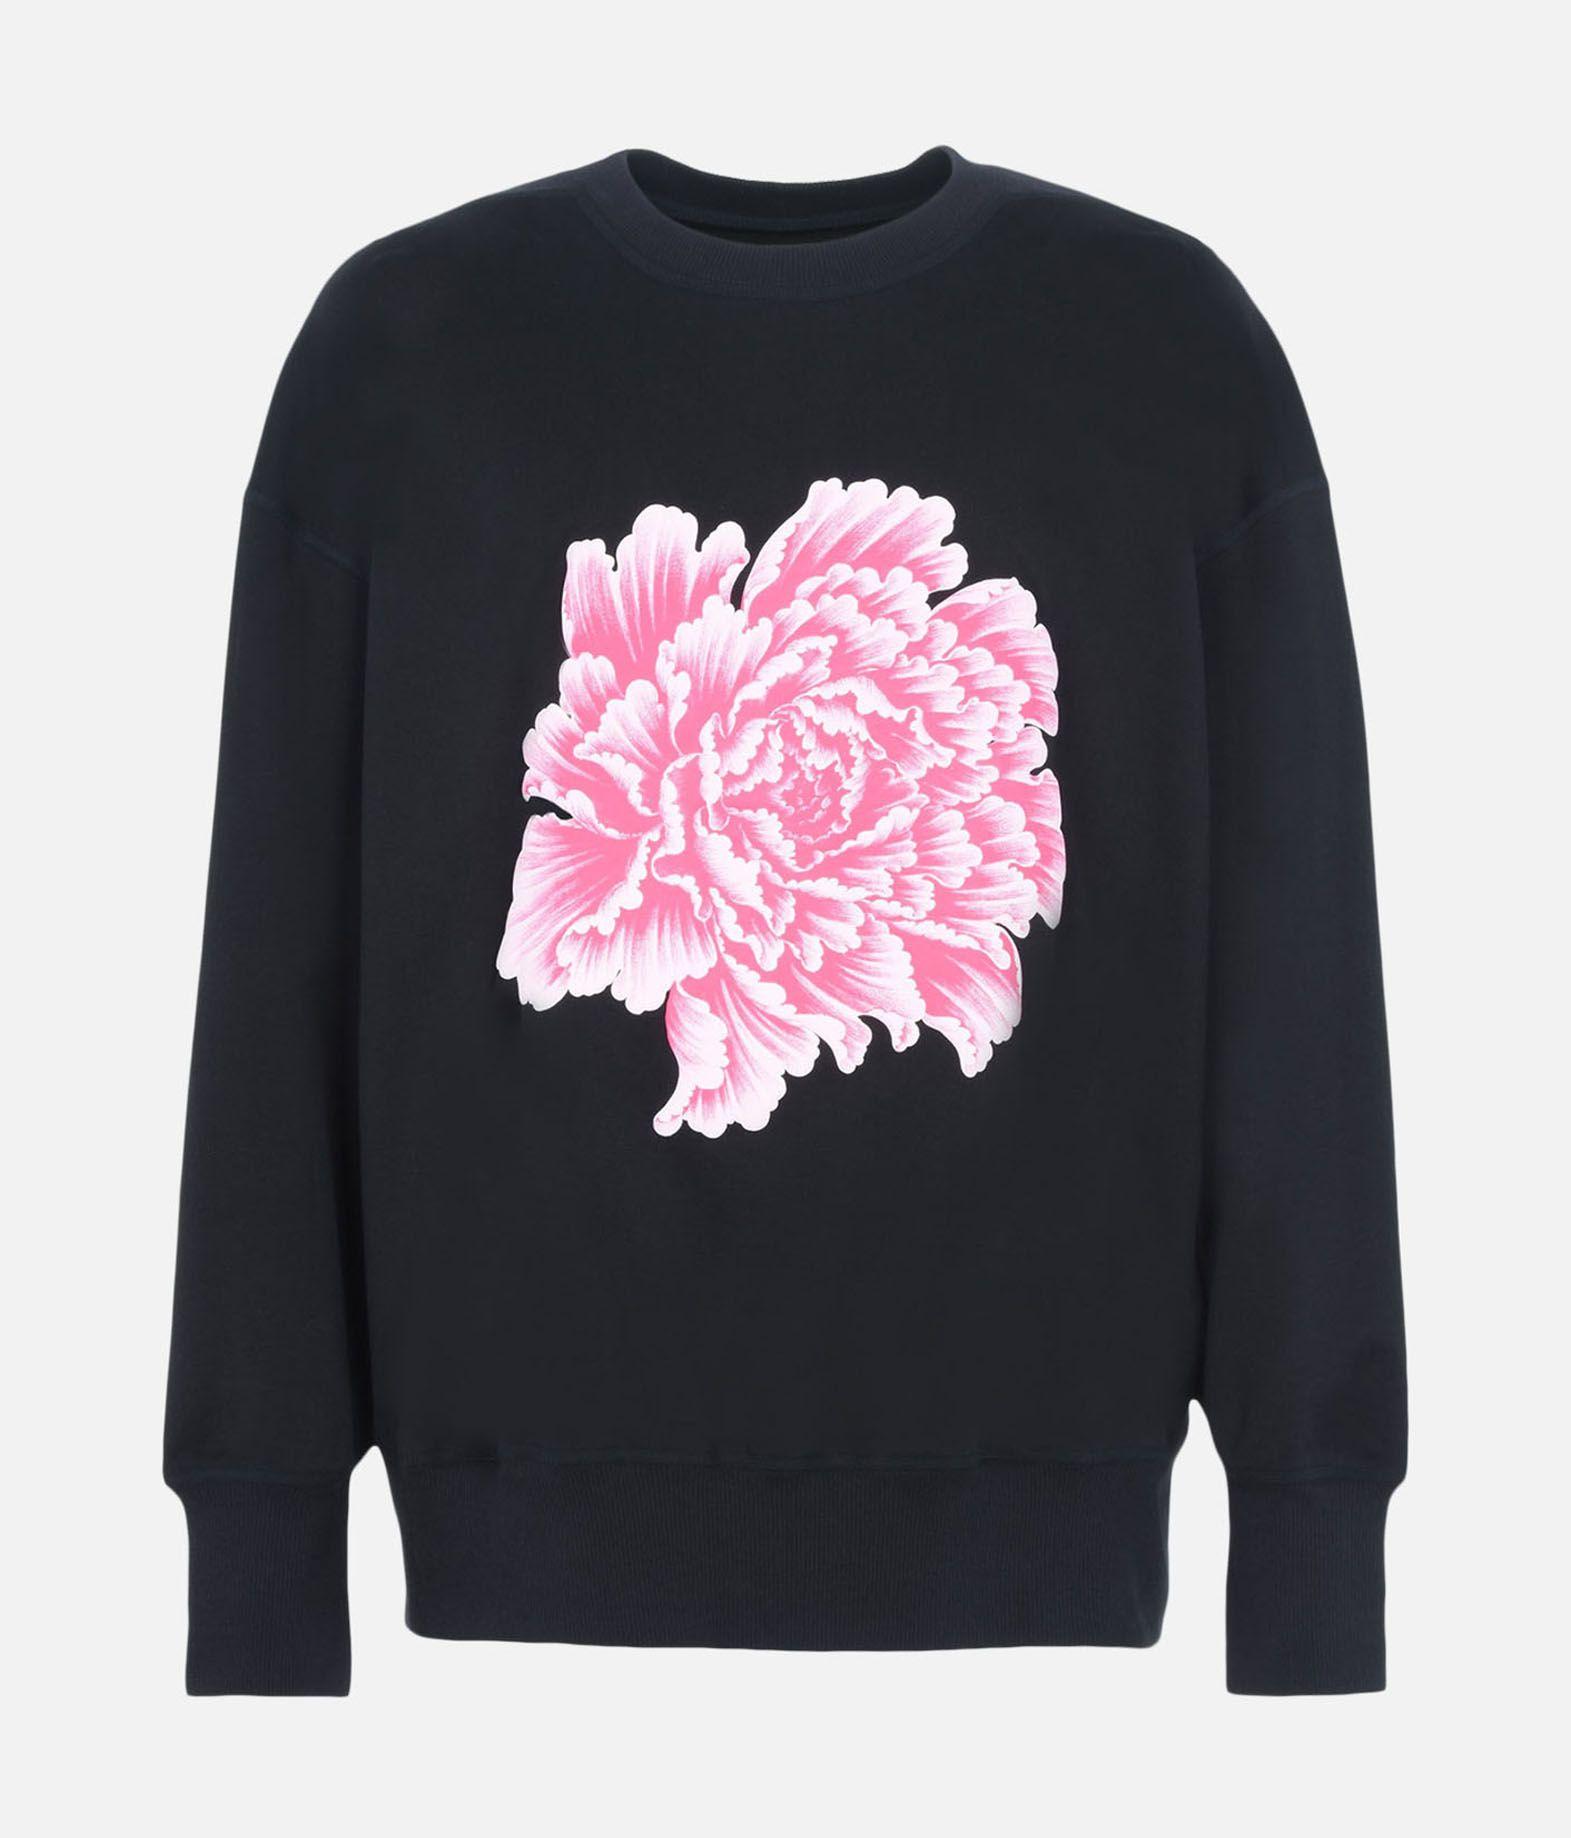 Y 3 CREW SWEAT Sweatshirts Black   Adidas Y-3 Official ... 03d6955a523d